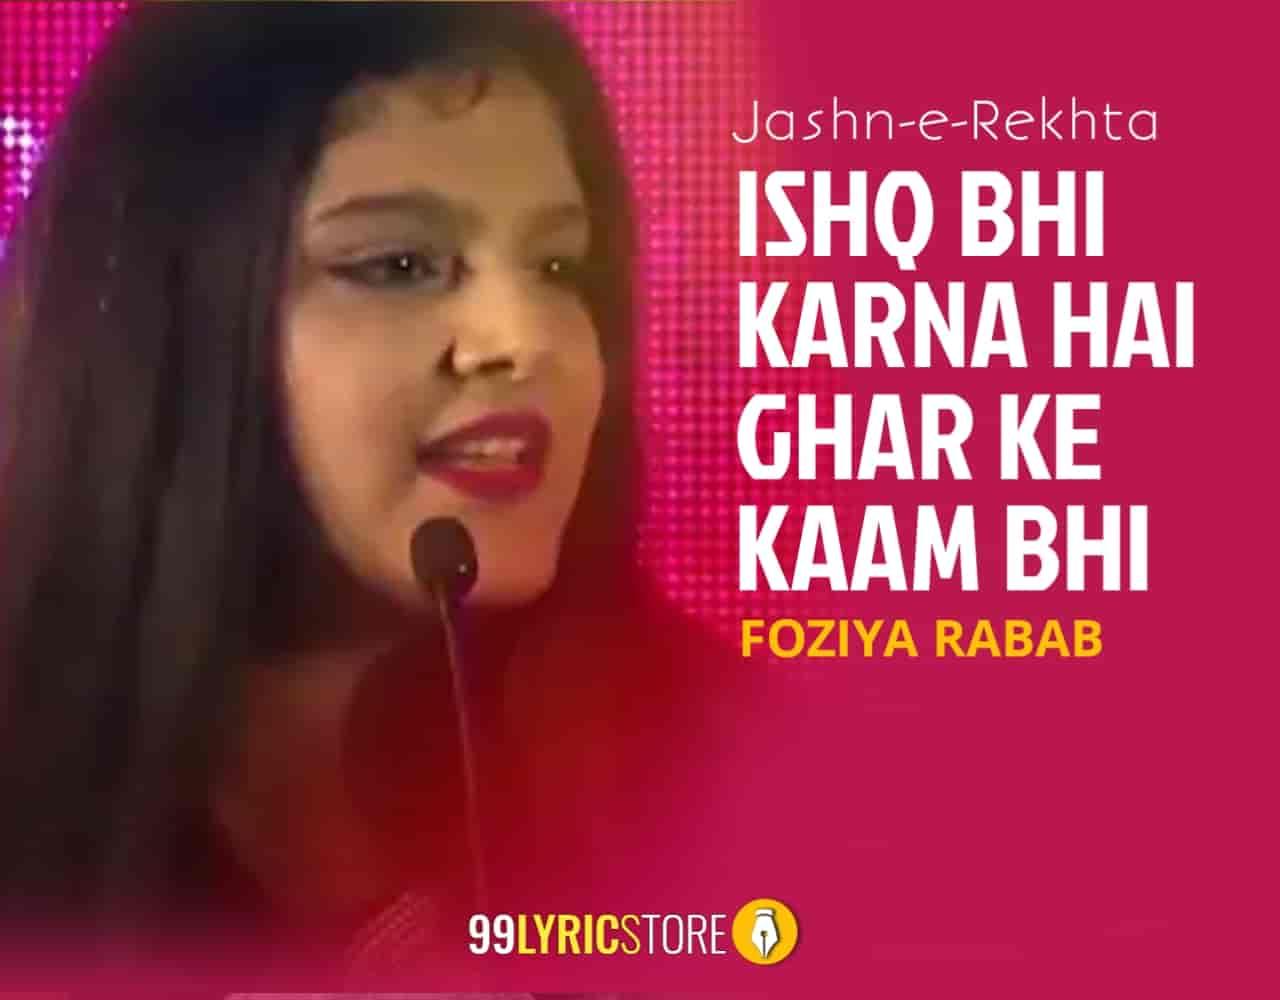 About This Shayari:-   This Beautiful Shayari 'Ishq Bhi Karna Hai Ghar Ke Kaam Bhi' which is written and performed by Foziya Rabab for Jashn-e-Rekhta.